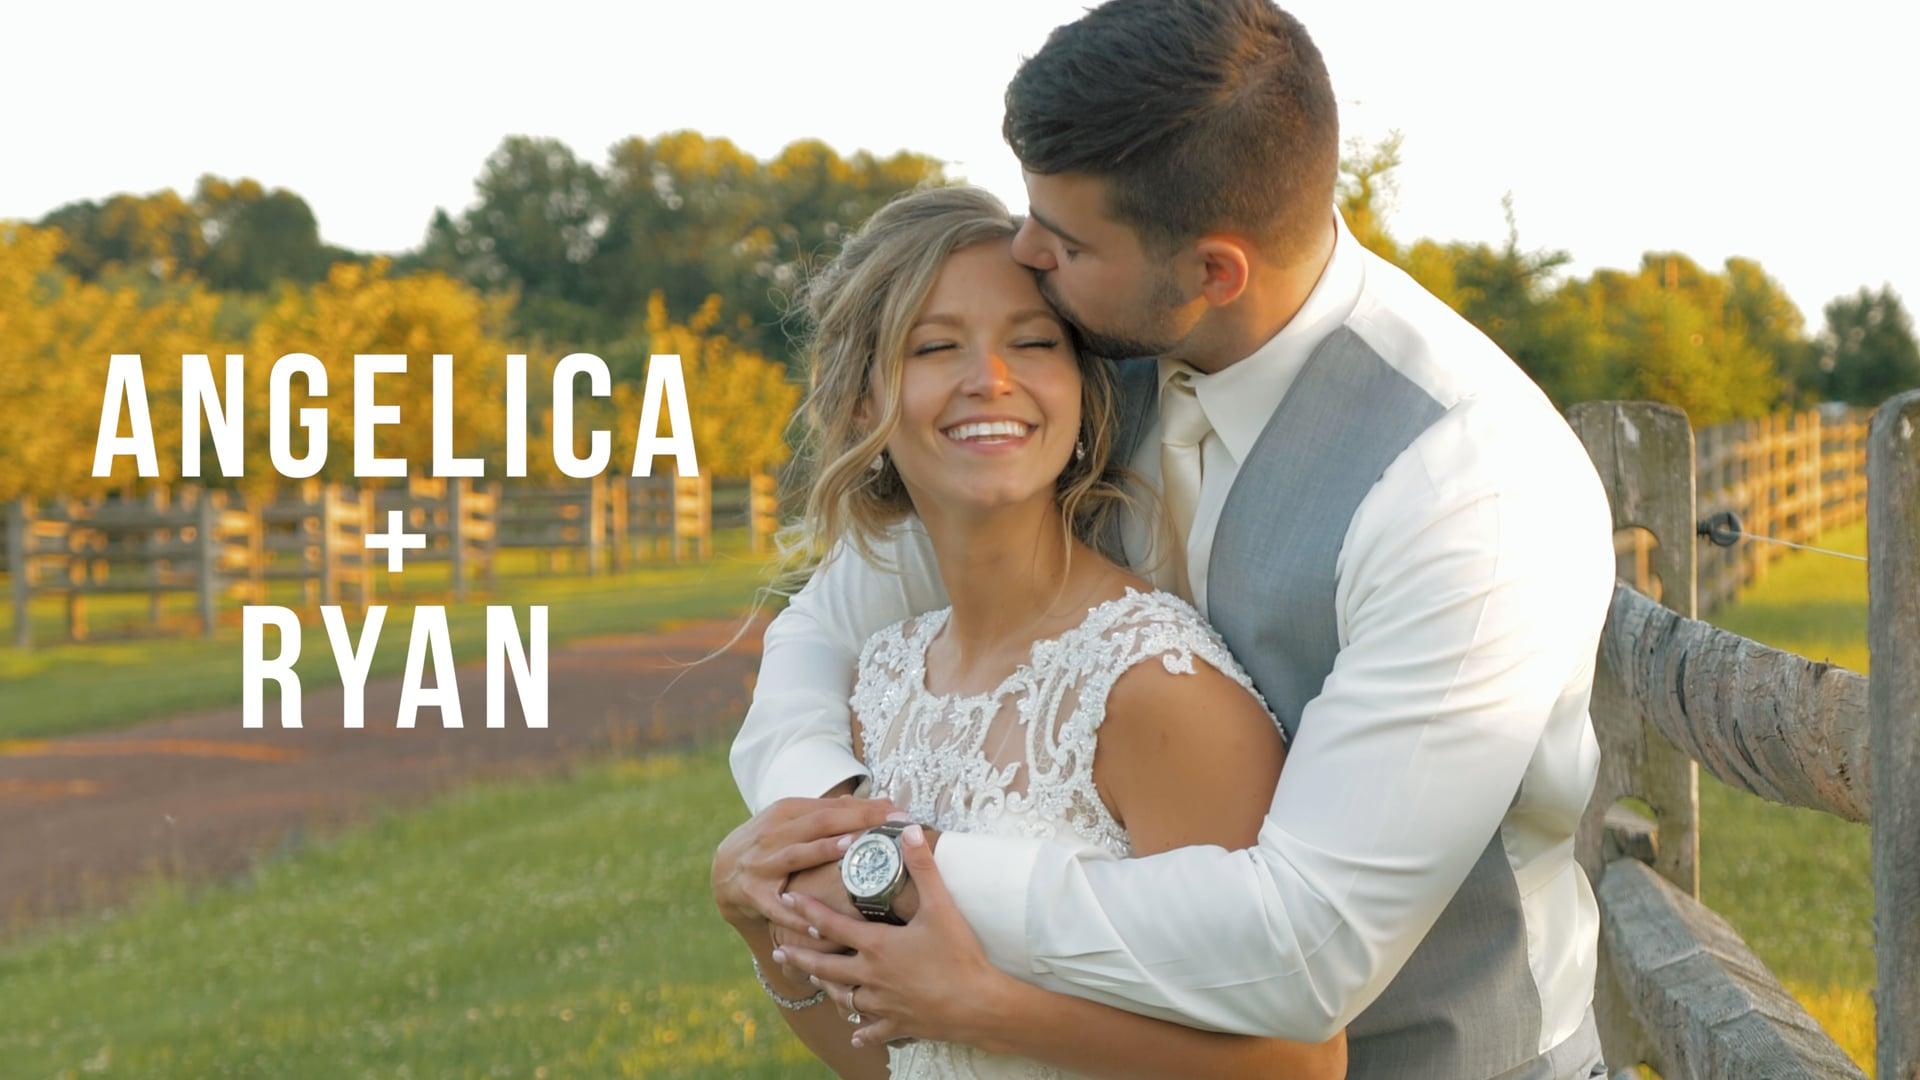 Angelica + Ryan - 6.22.19